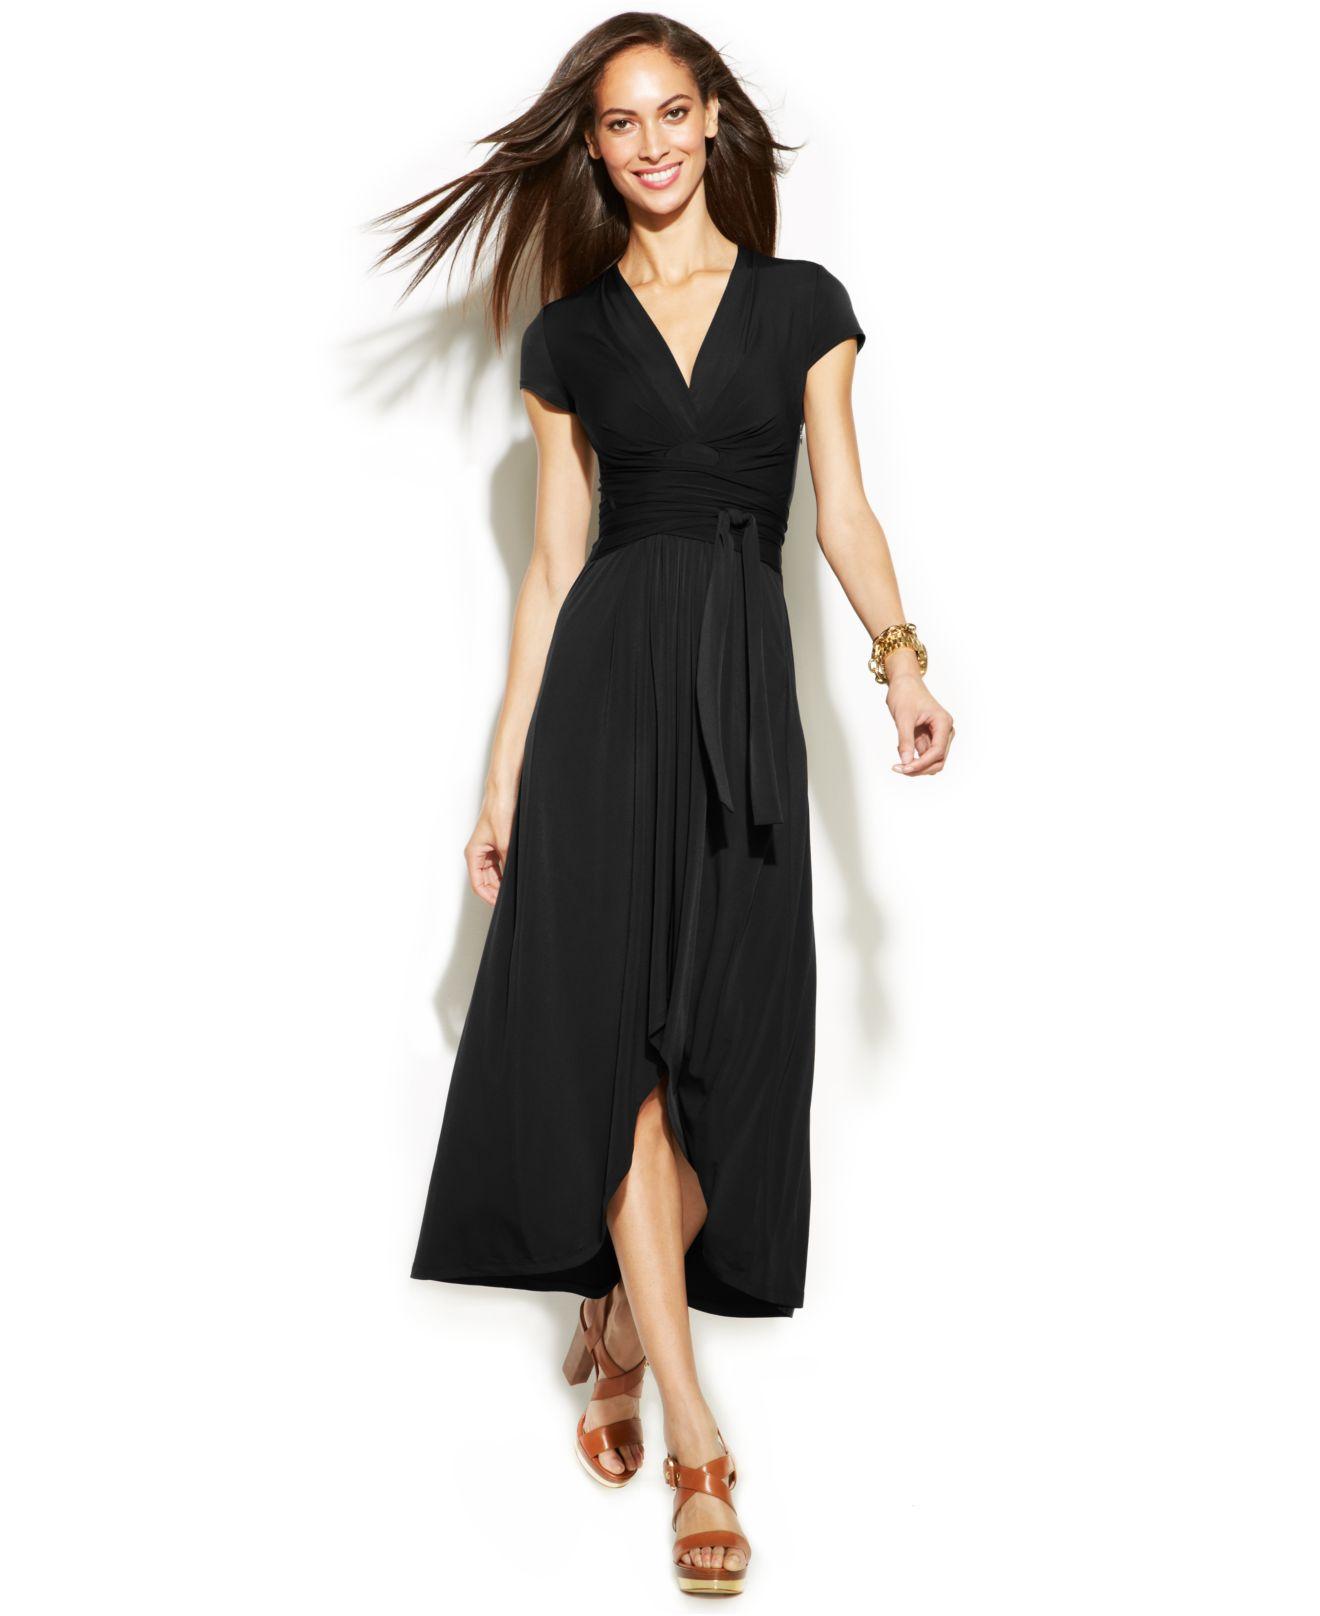 Michael kors Michael High-low Faux-wrap Dress in Black | Lyst